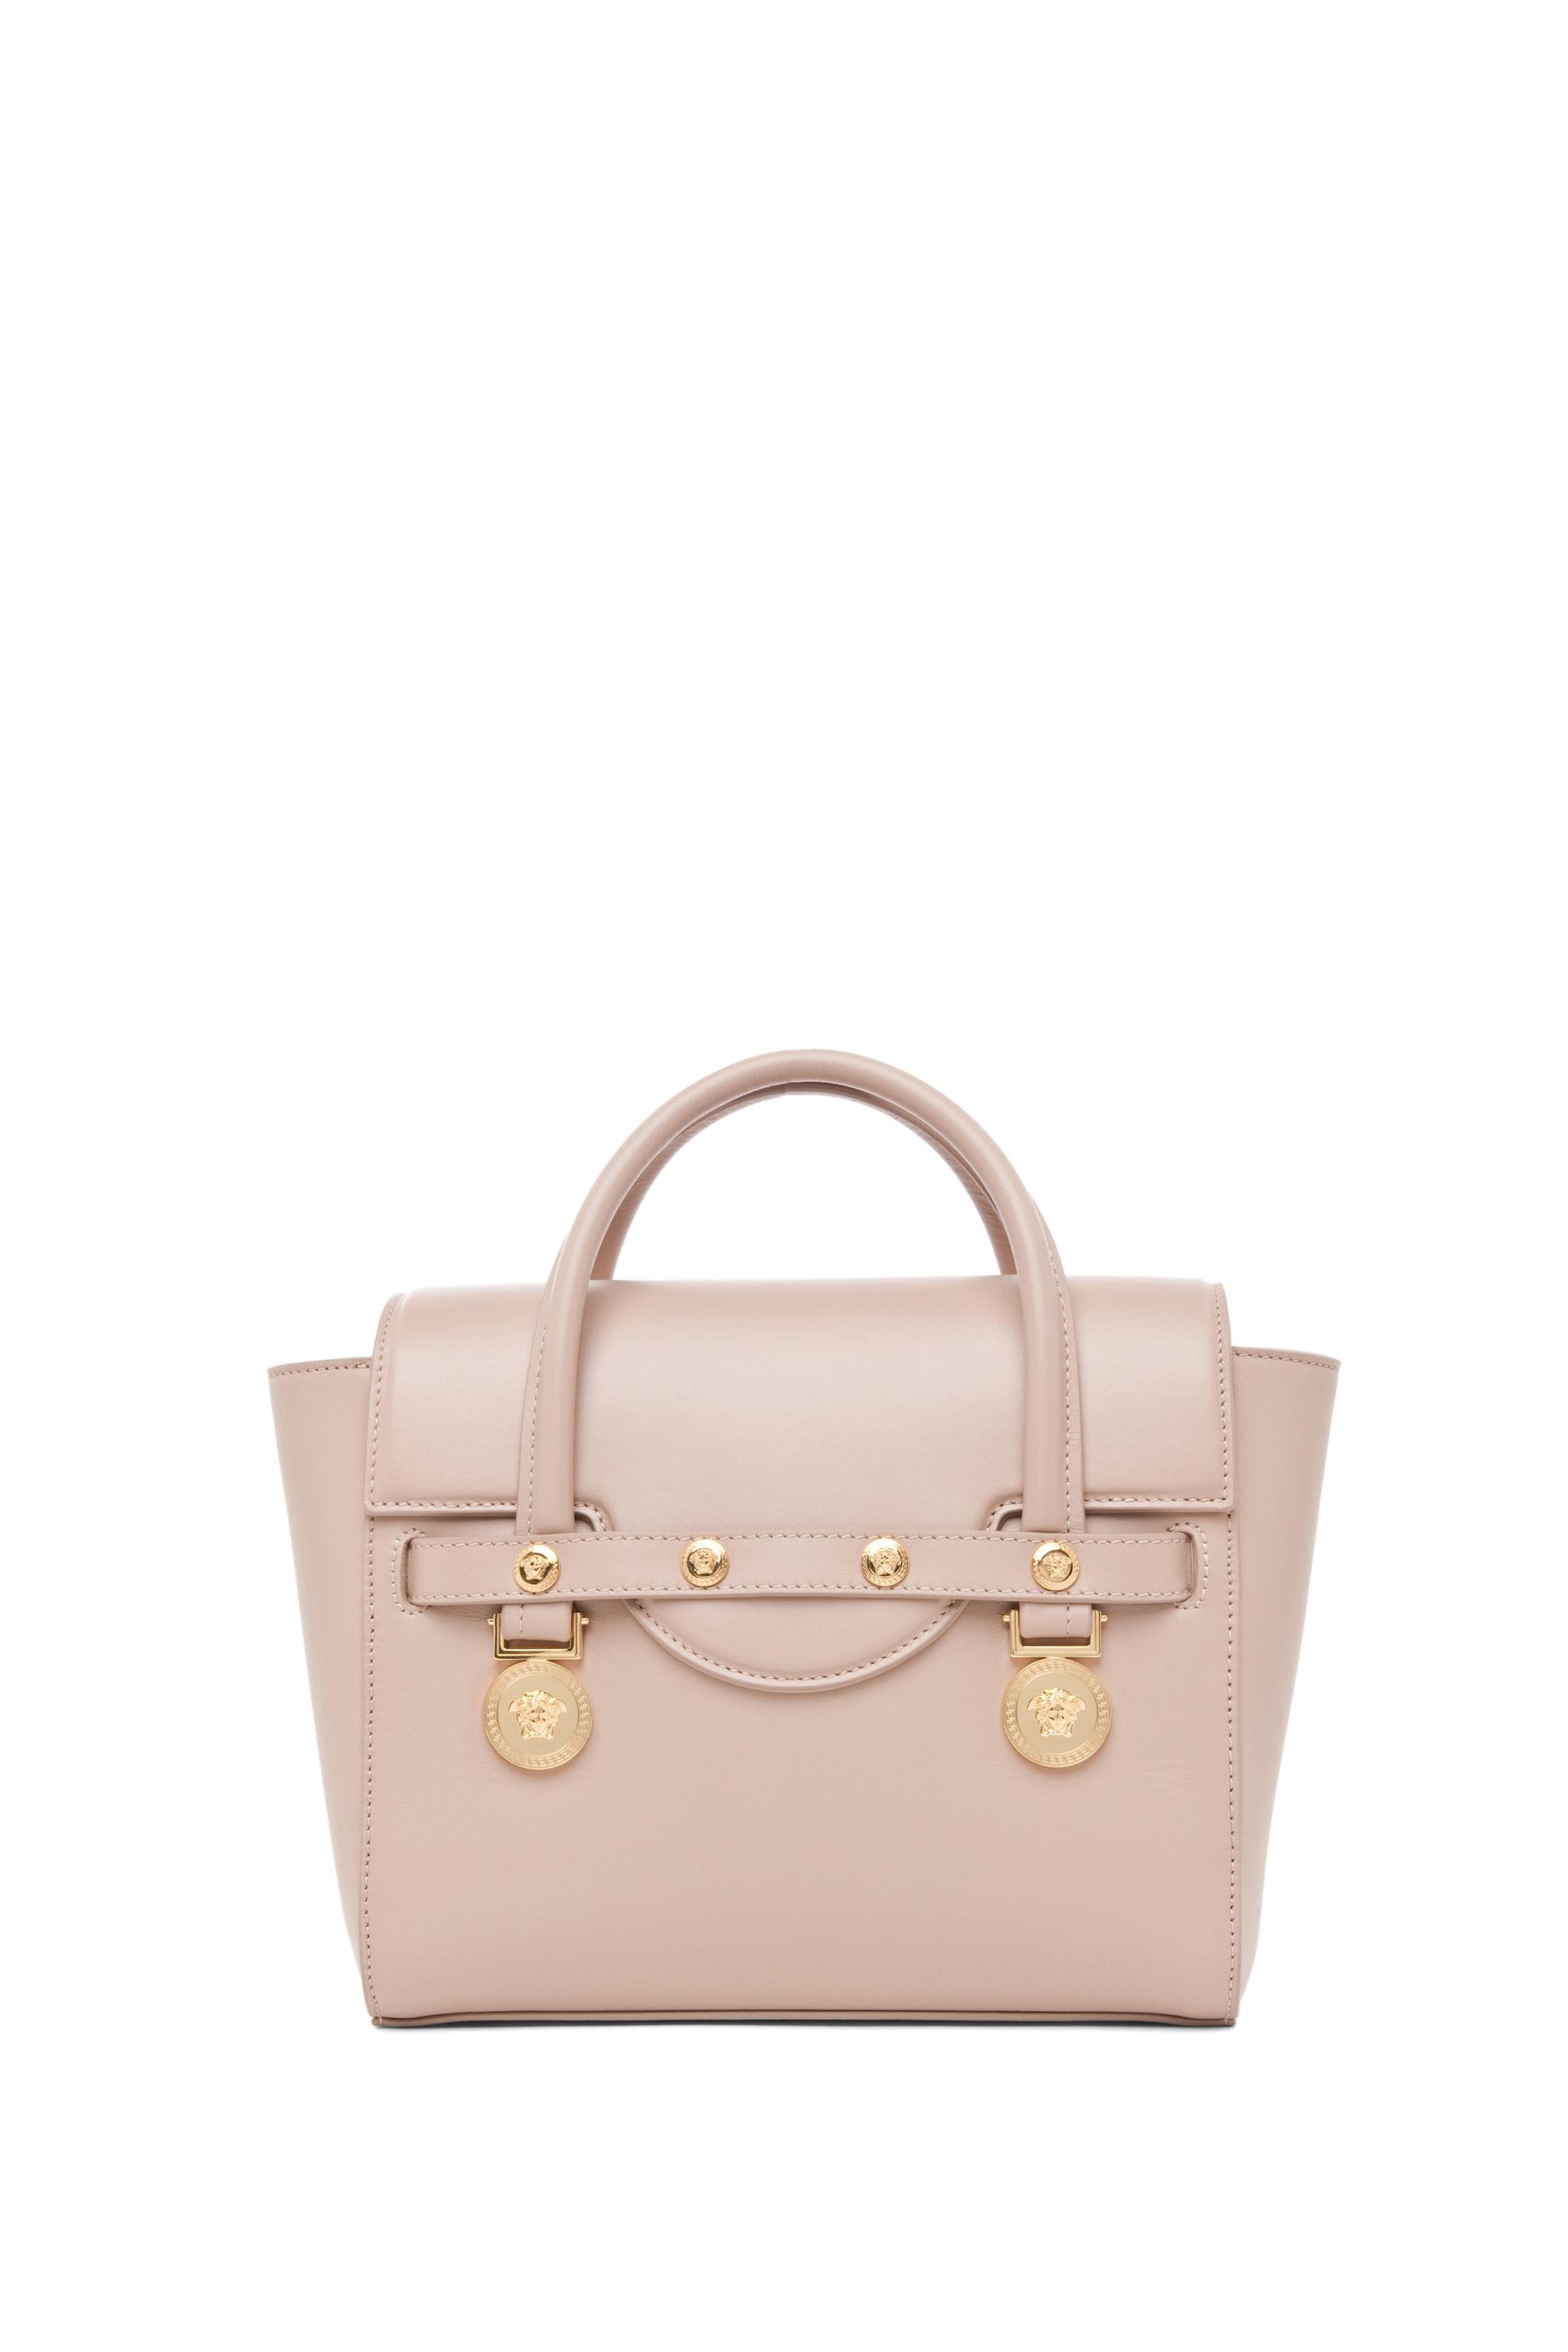 Image 2 of VERSACE Signature Handbag in Blush